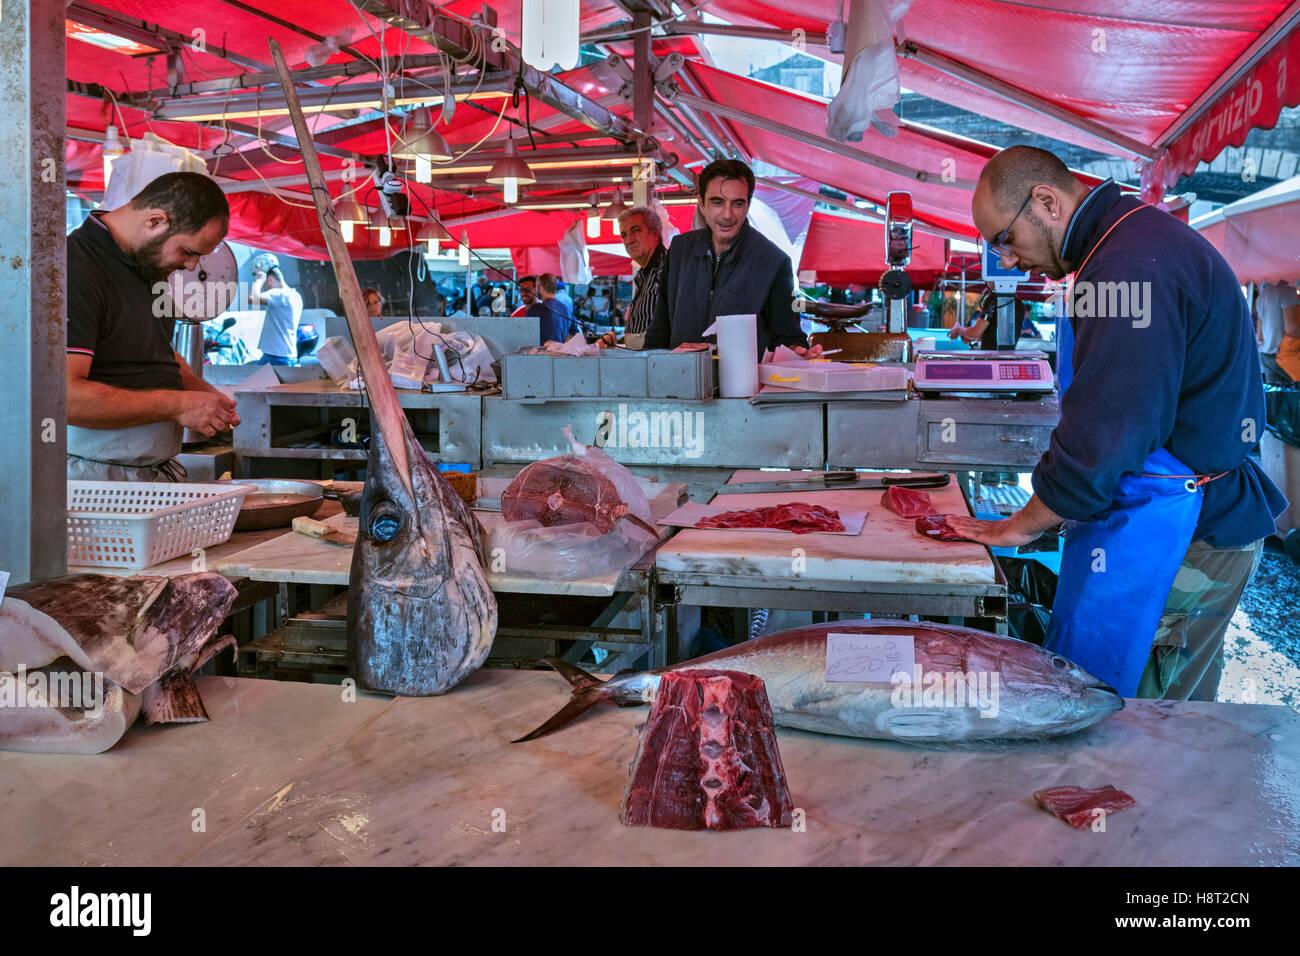 La Pescheria, mercado de pescado, Catania, Sicilia, Italia Imagen De Stock